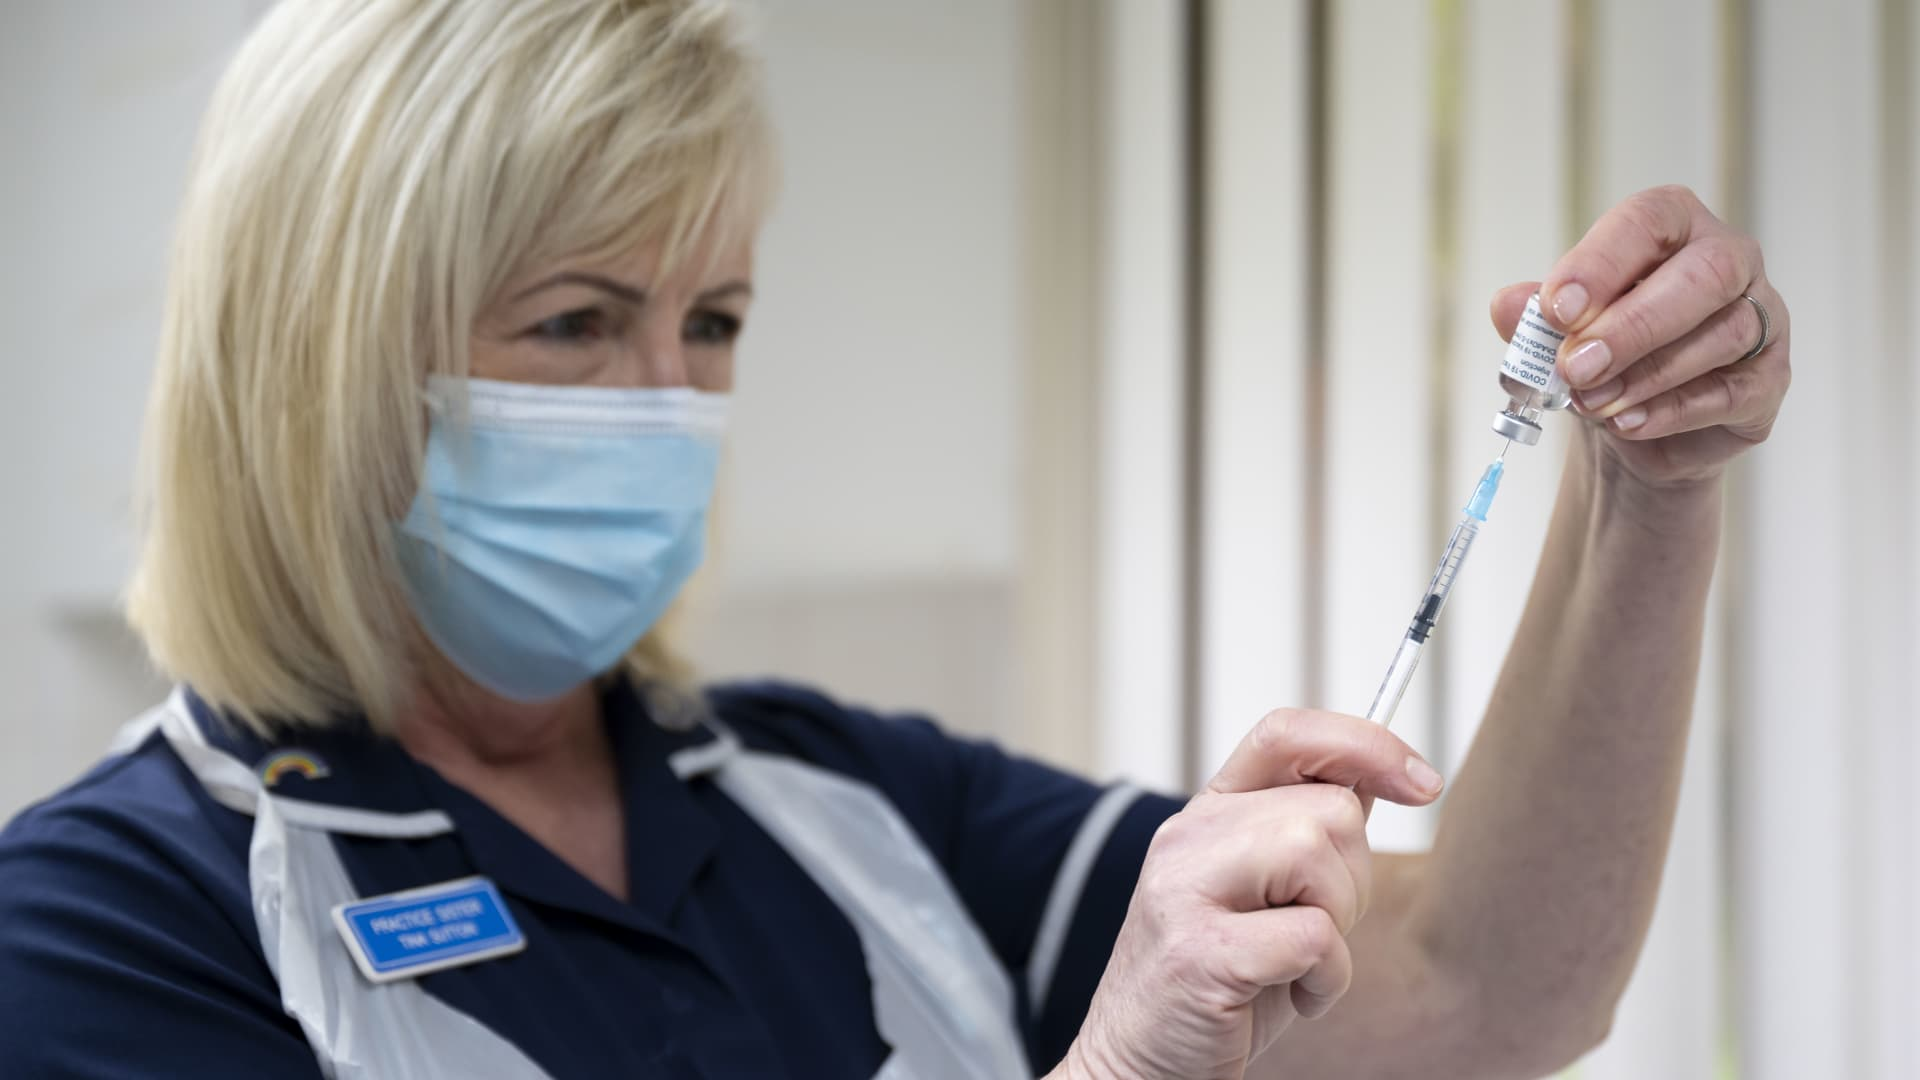 A nurse prepares the Oxford-AstraZeneca vaccine at Pontcae Medical Practice on January 4, 2021 in Merthyr Tydfil, Wales.